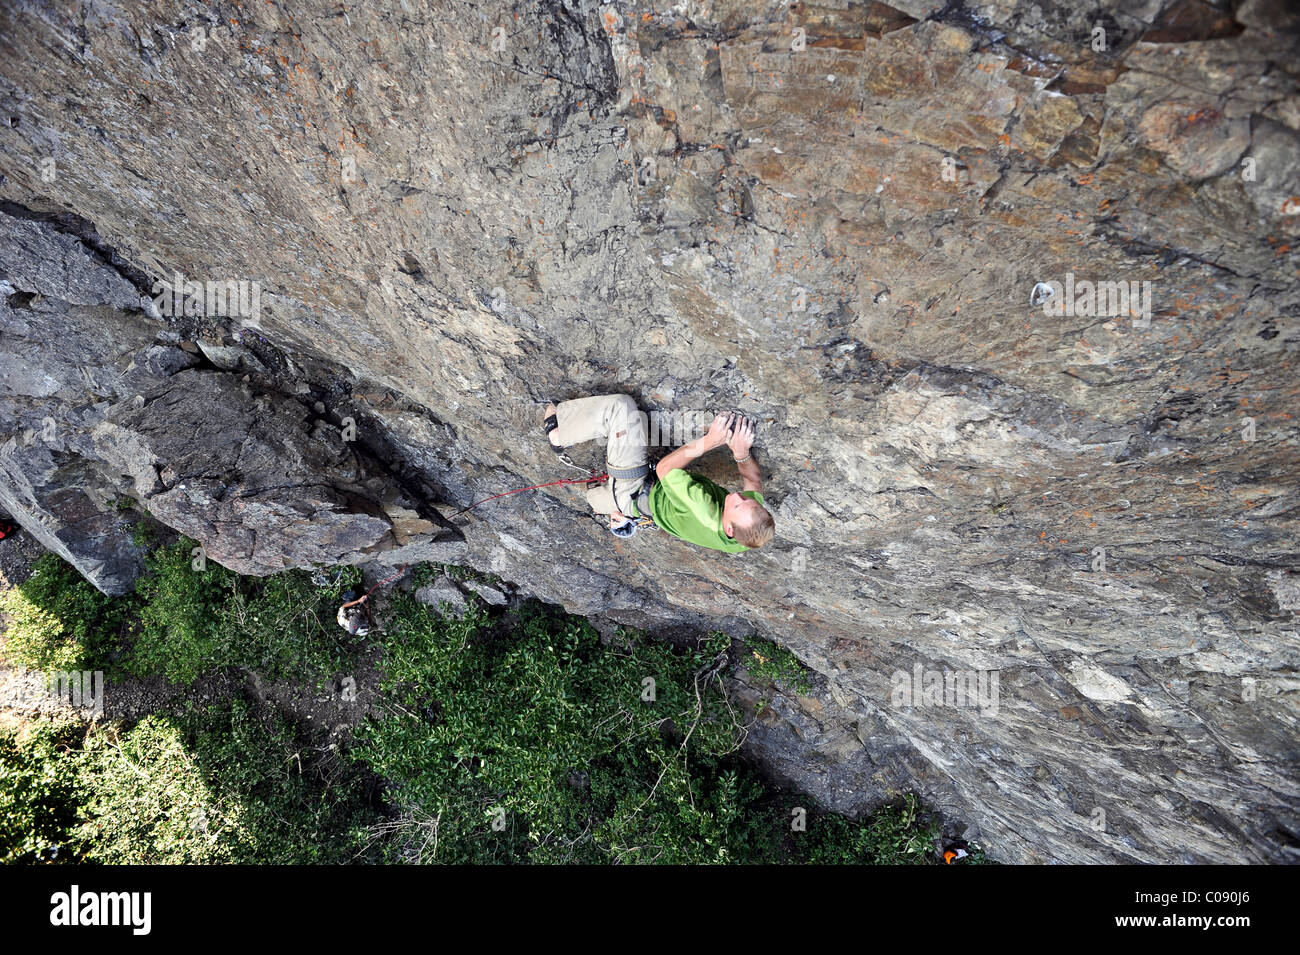 Man rock climbing along Turnagain Arm near Anchorage, Southcentral Alaska, Summer - Stock Image